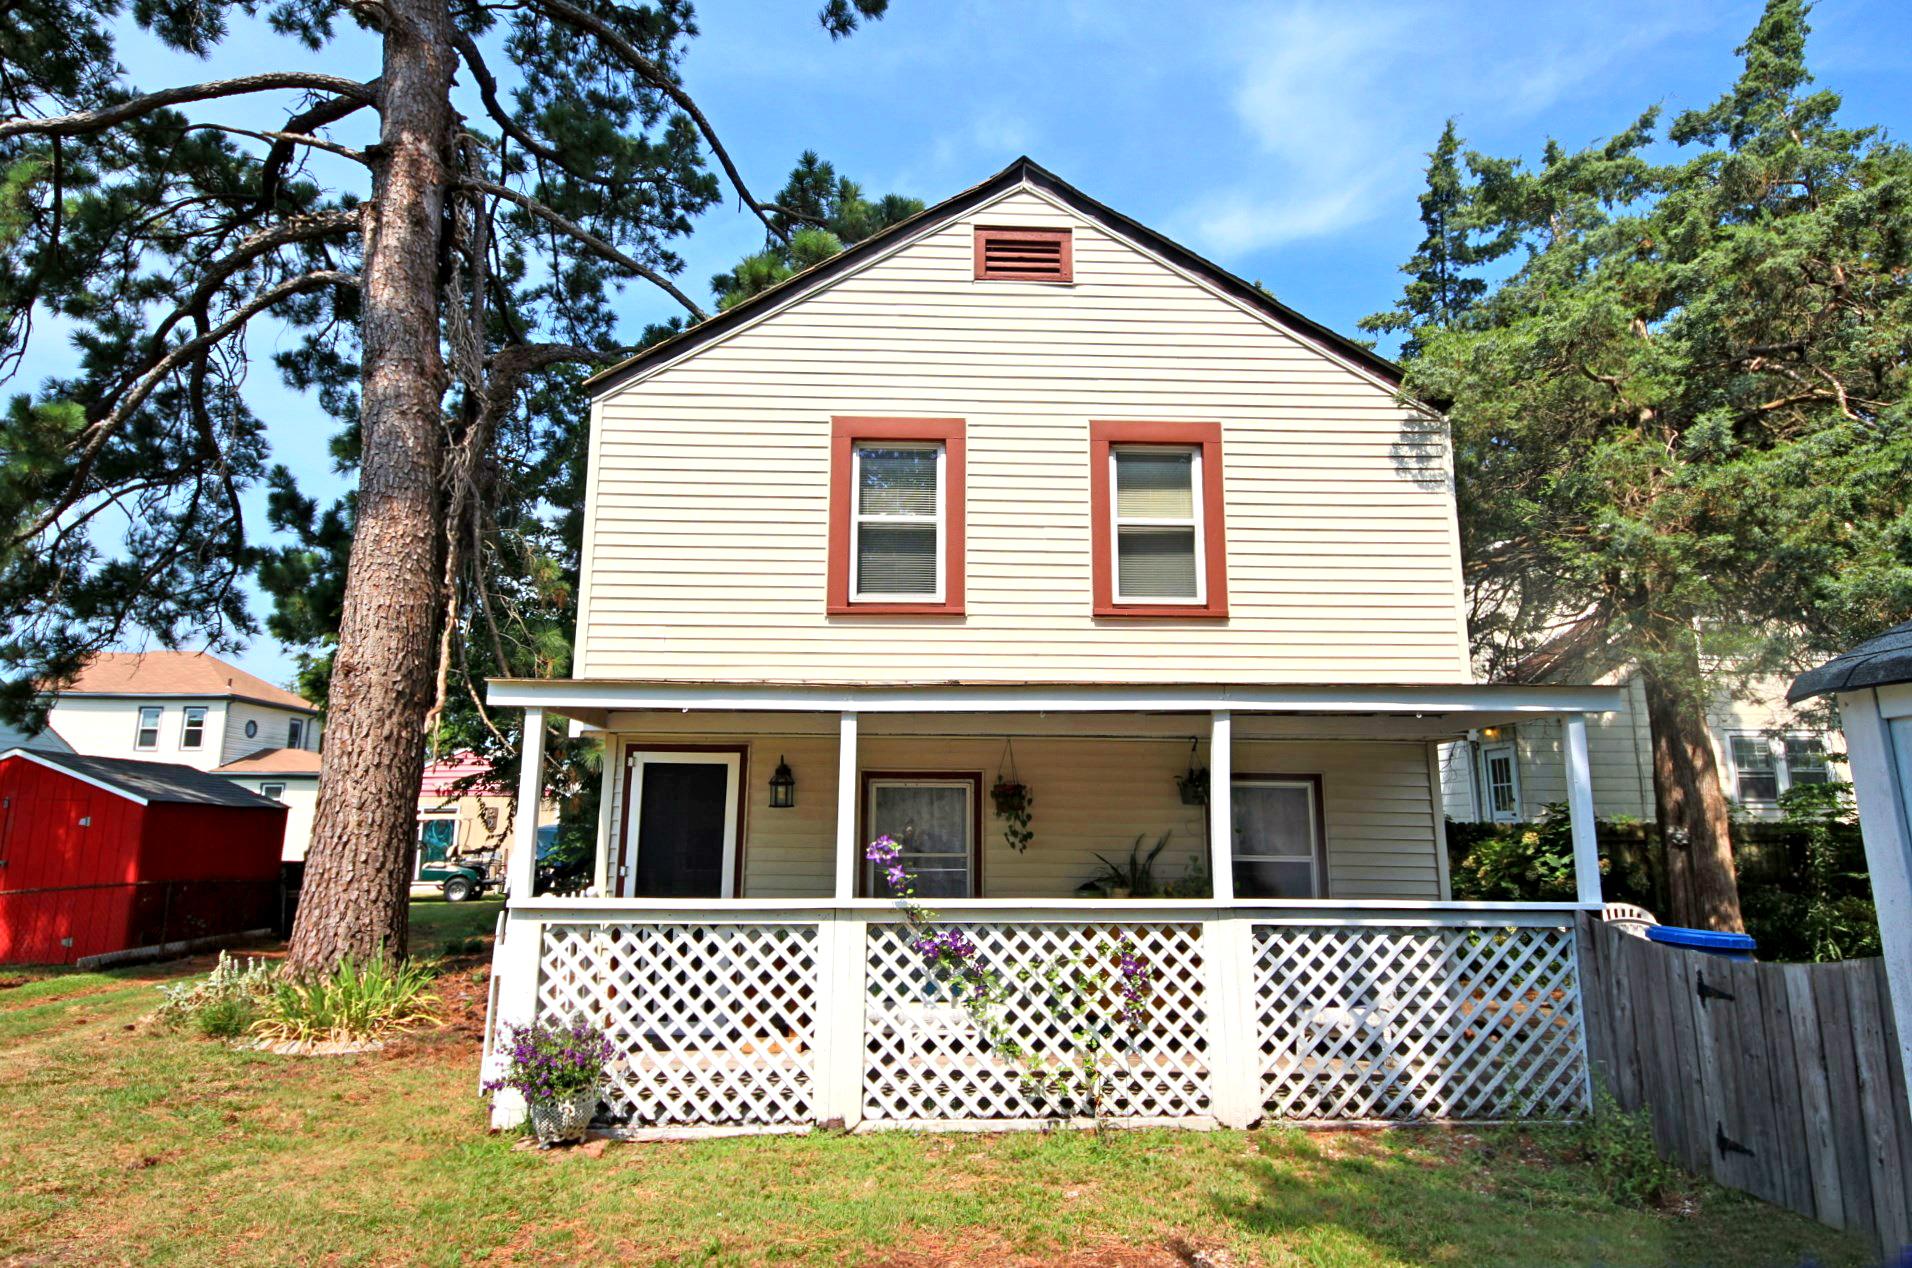 1717 Barron Street: Sold!